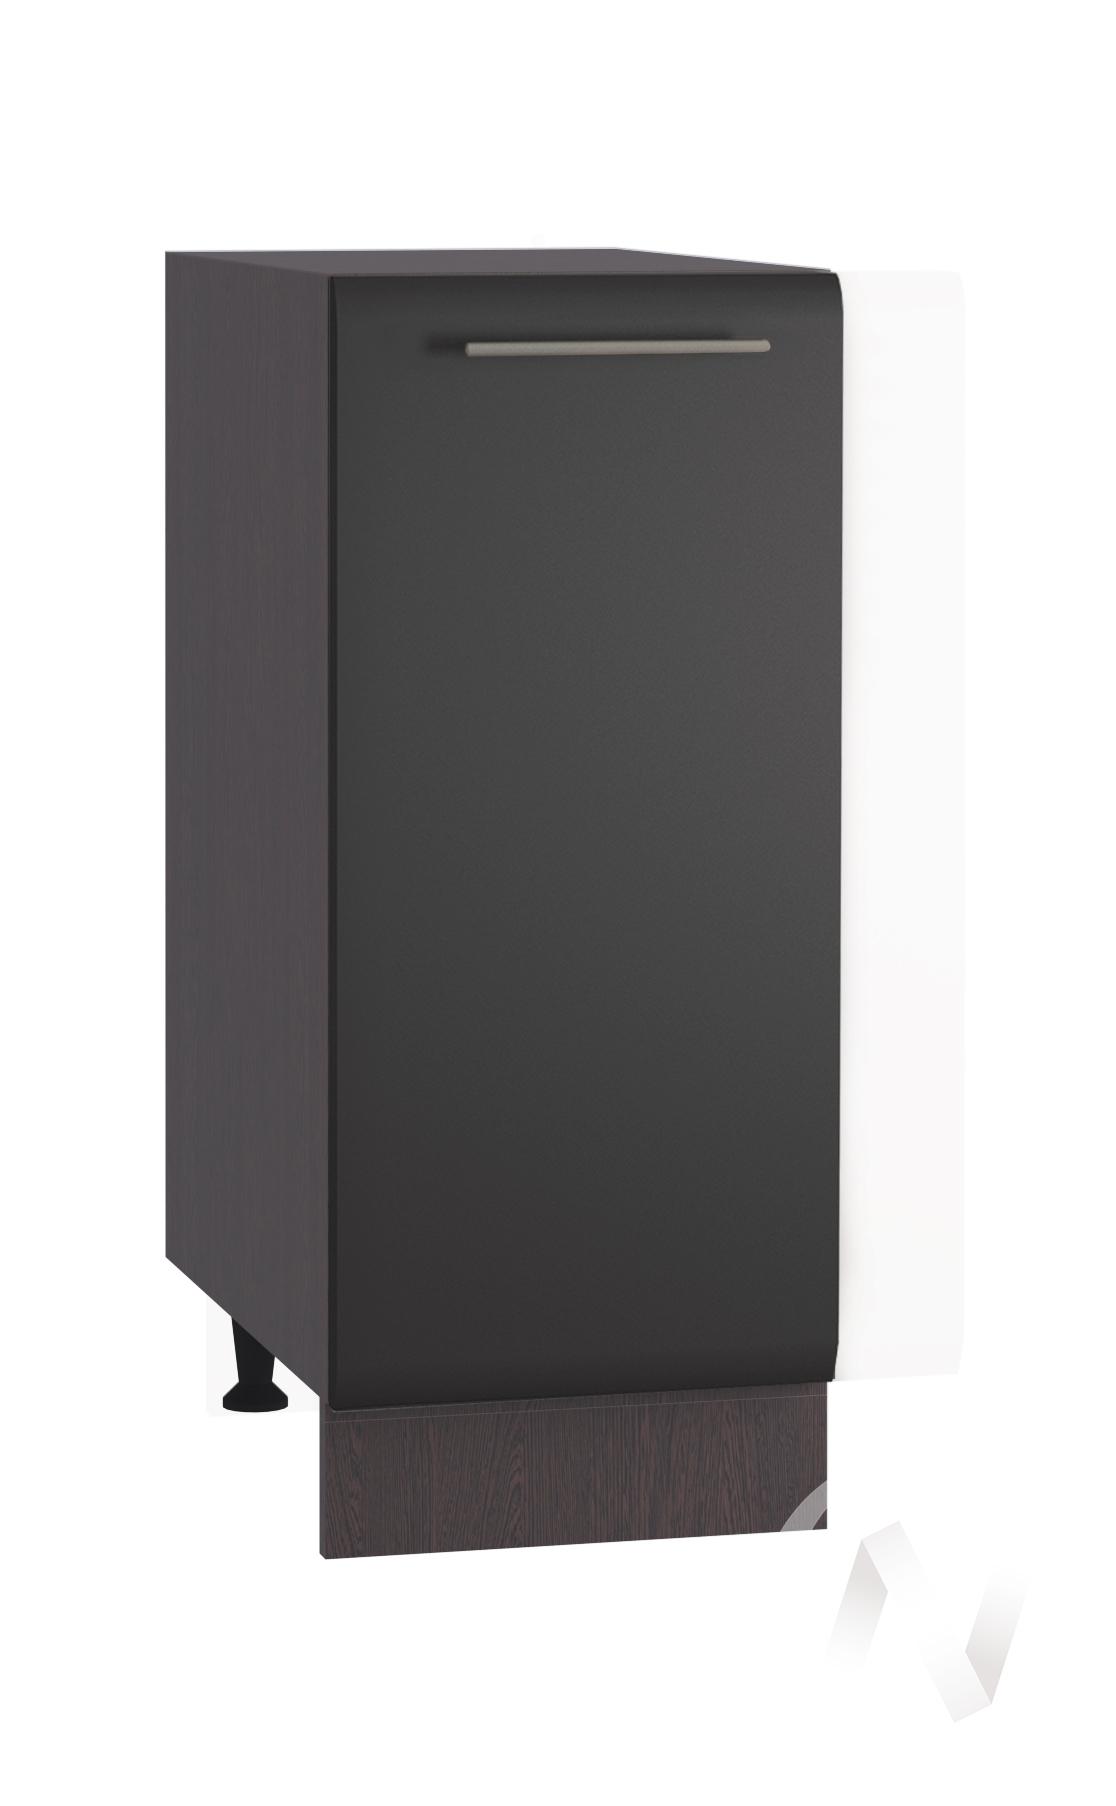 "Кухня ""Люкс"": Шкаф нижний 300, ШН 300 (Шелк венге/корпус венге)"